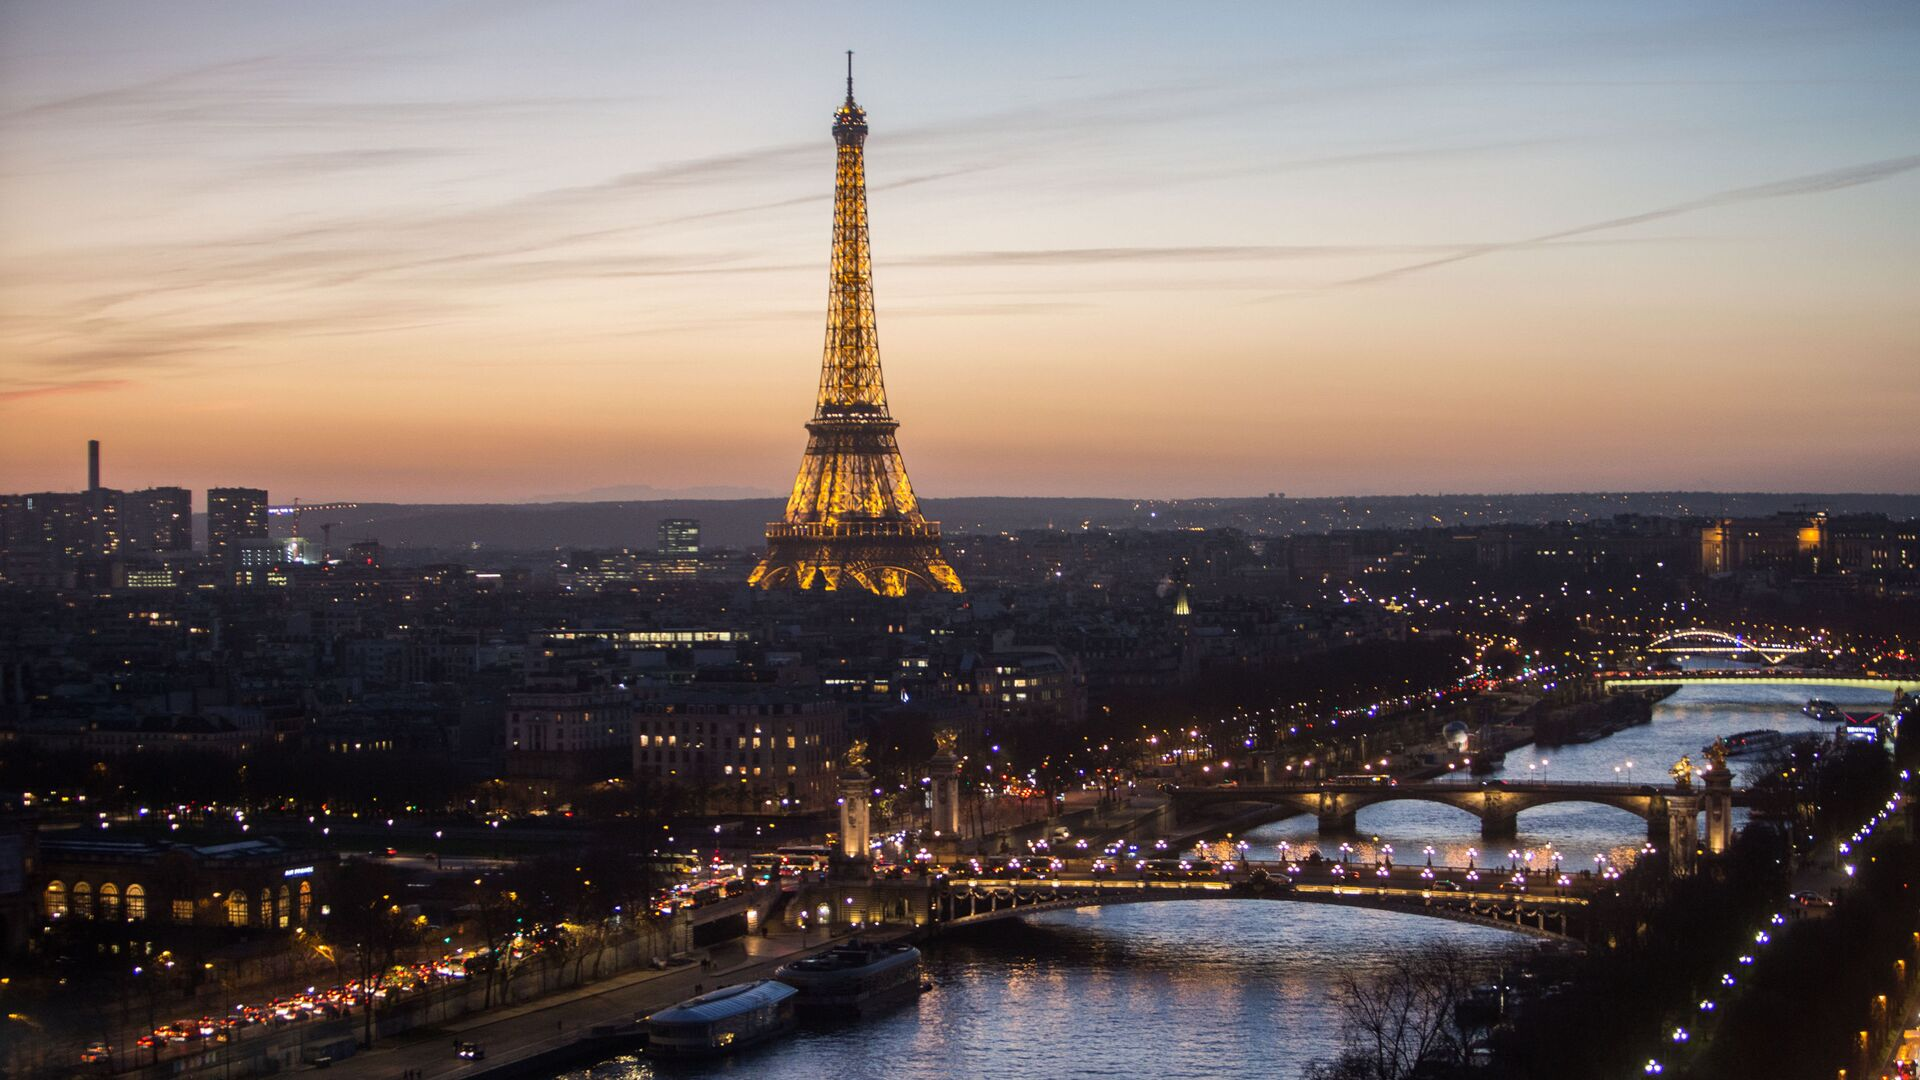 Vista sulla Tour Eiffel a Parigi - Sputnik Italia, 1920, 13.09.2021